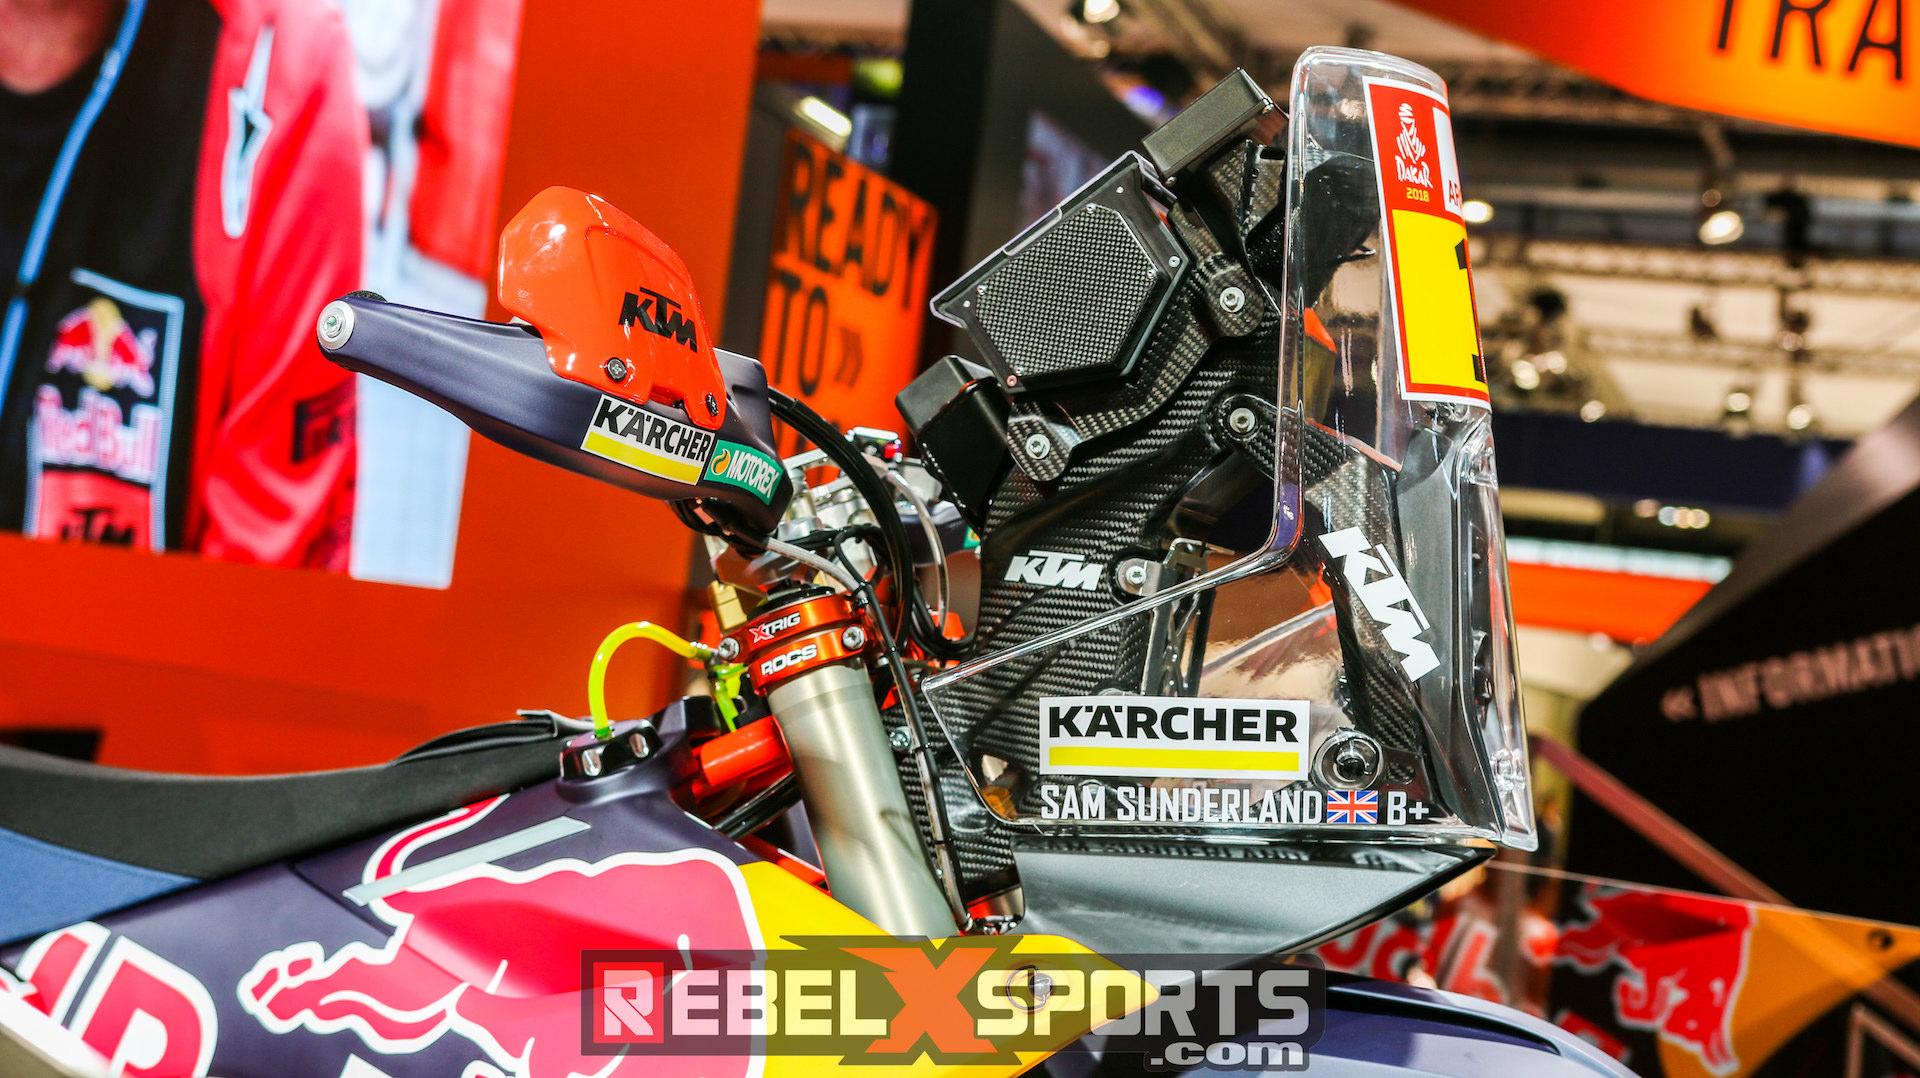 Detail Photos New Ktm Rally Replica 2018 Rebel X Sports Srl